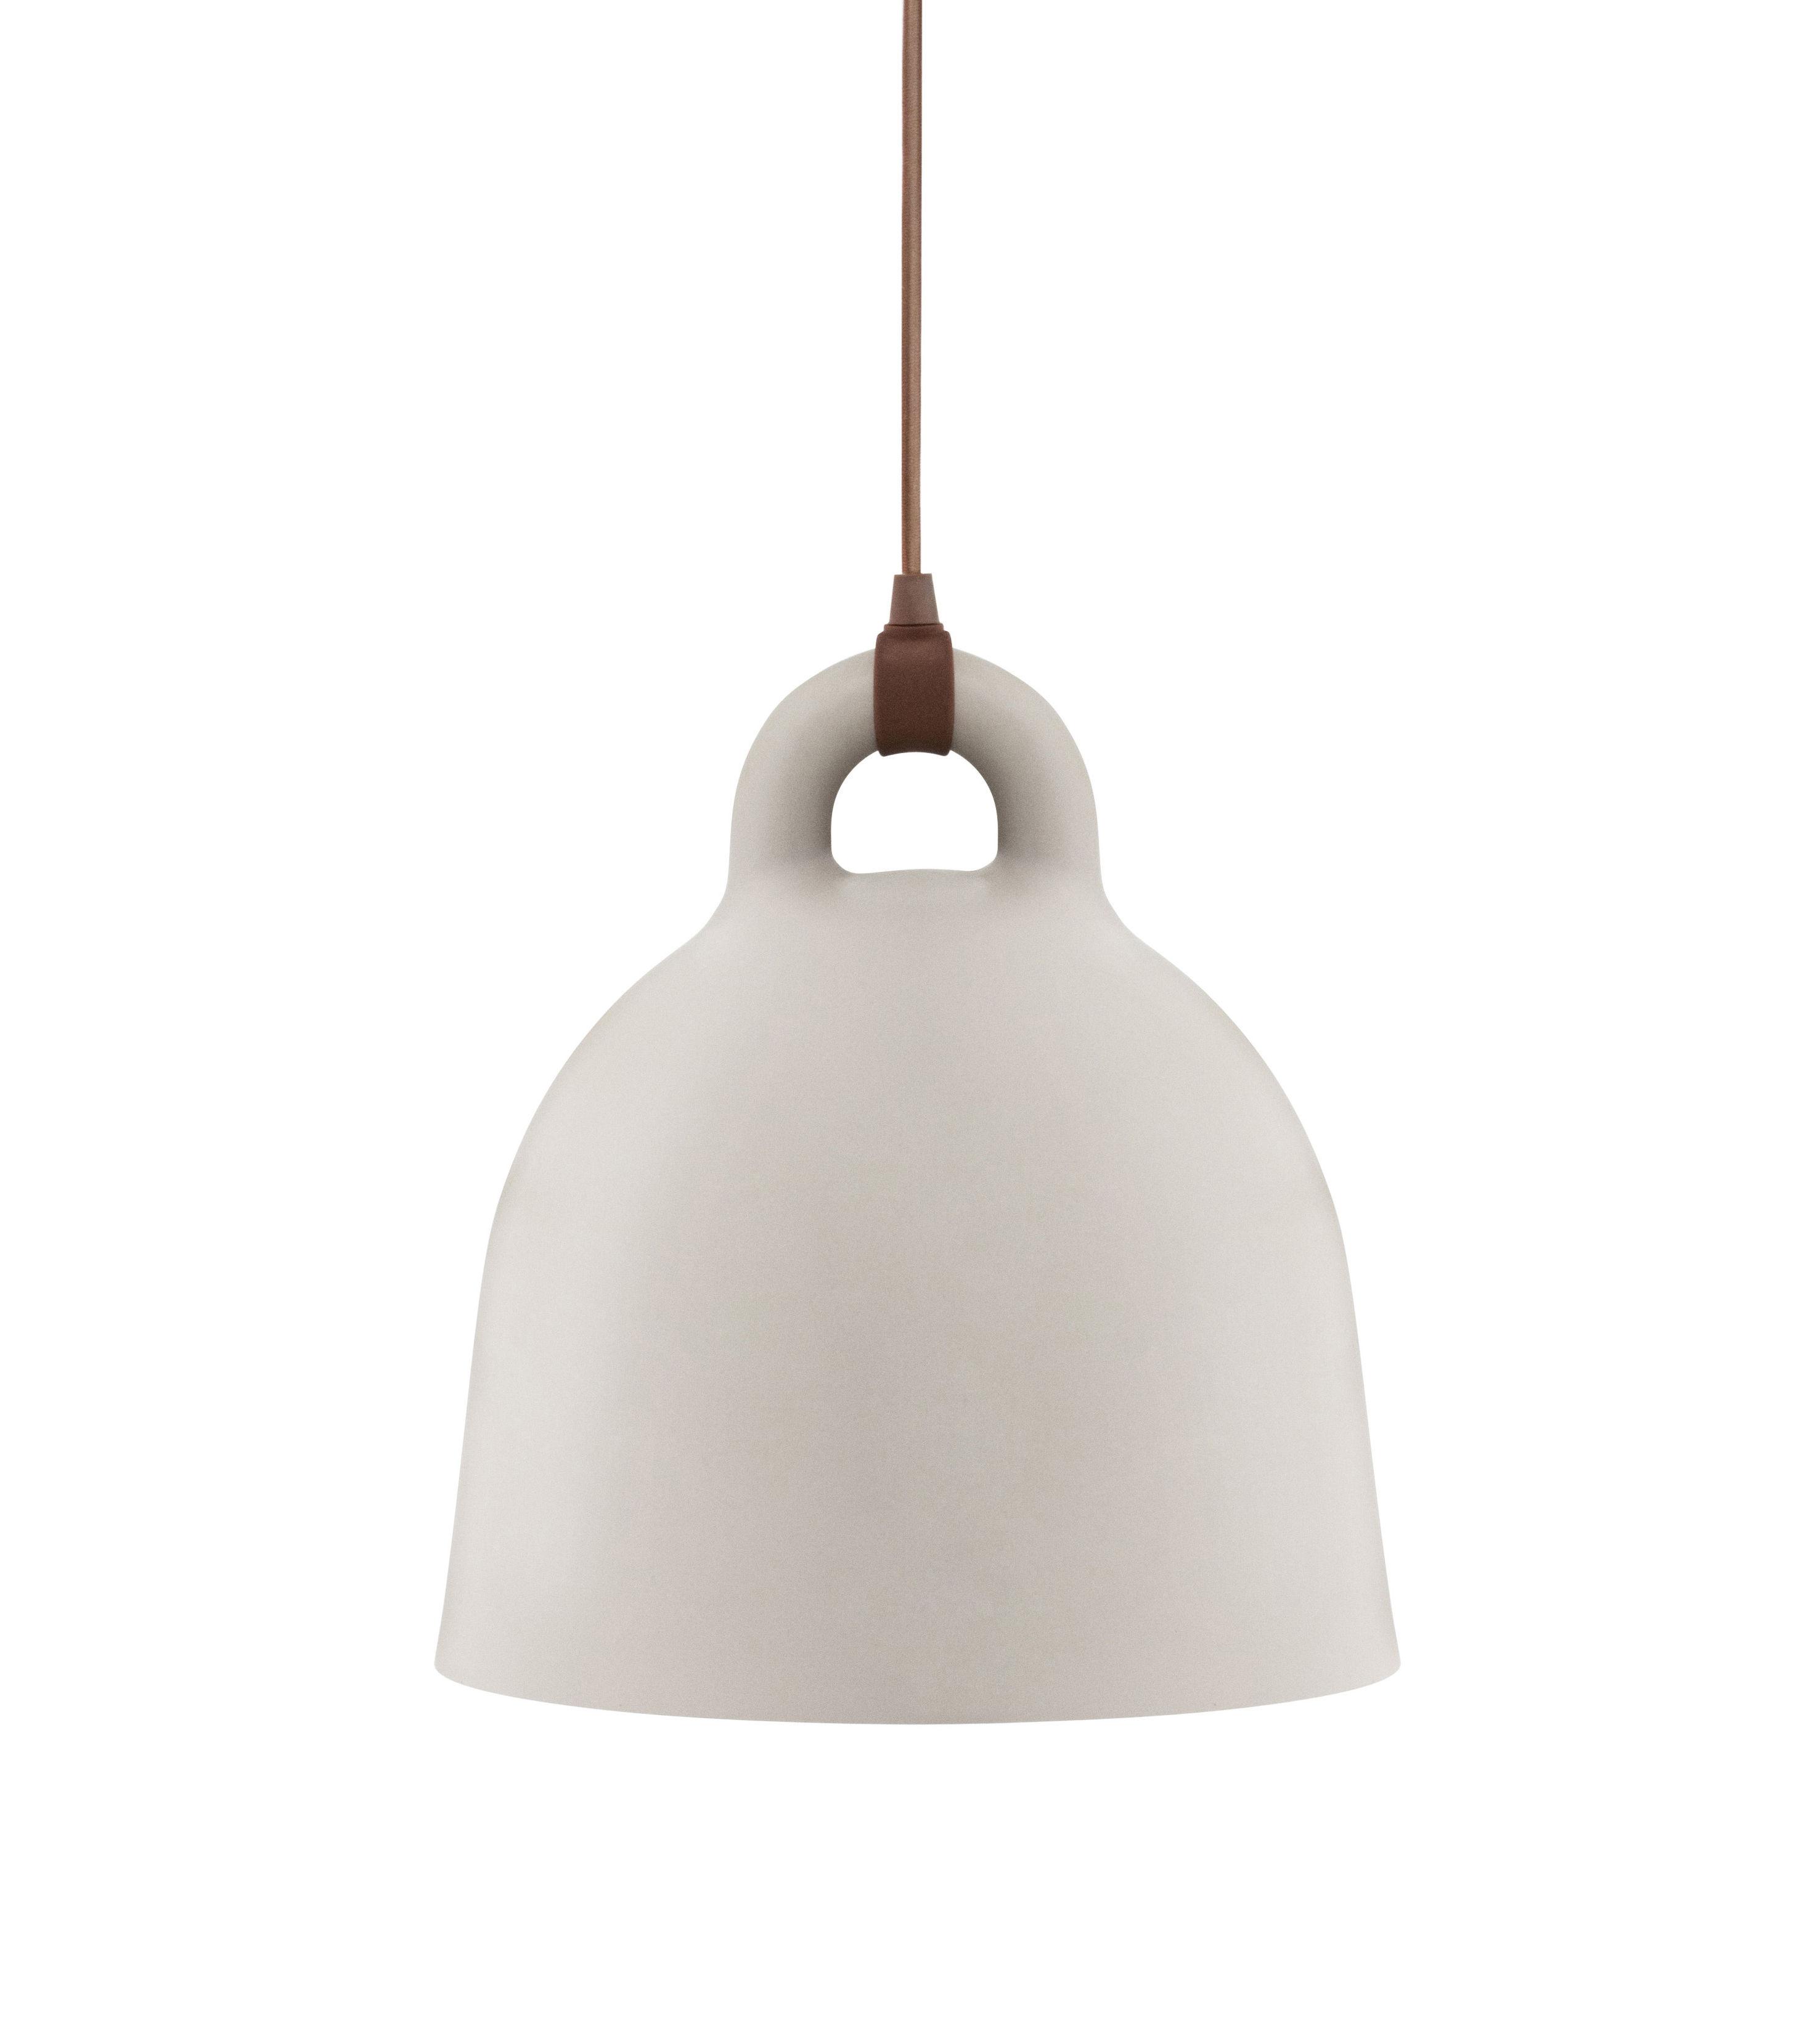 Leuchten - Pendelleuchten - Bell Pendelleuchte / XS - Ø 22 cm - Normann Copenhagen - Sandfarben - Aluminium